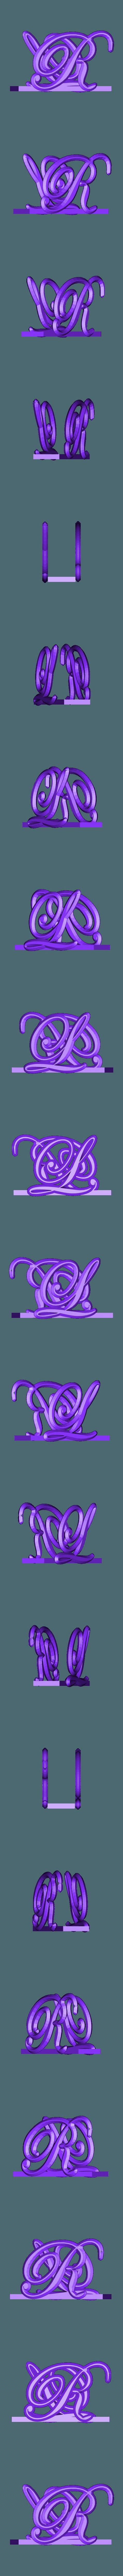 Menu_entier.stl Download free STL file Door Menu • 3D printer model, rcanon